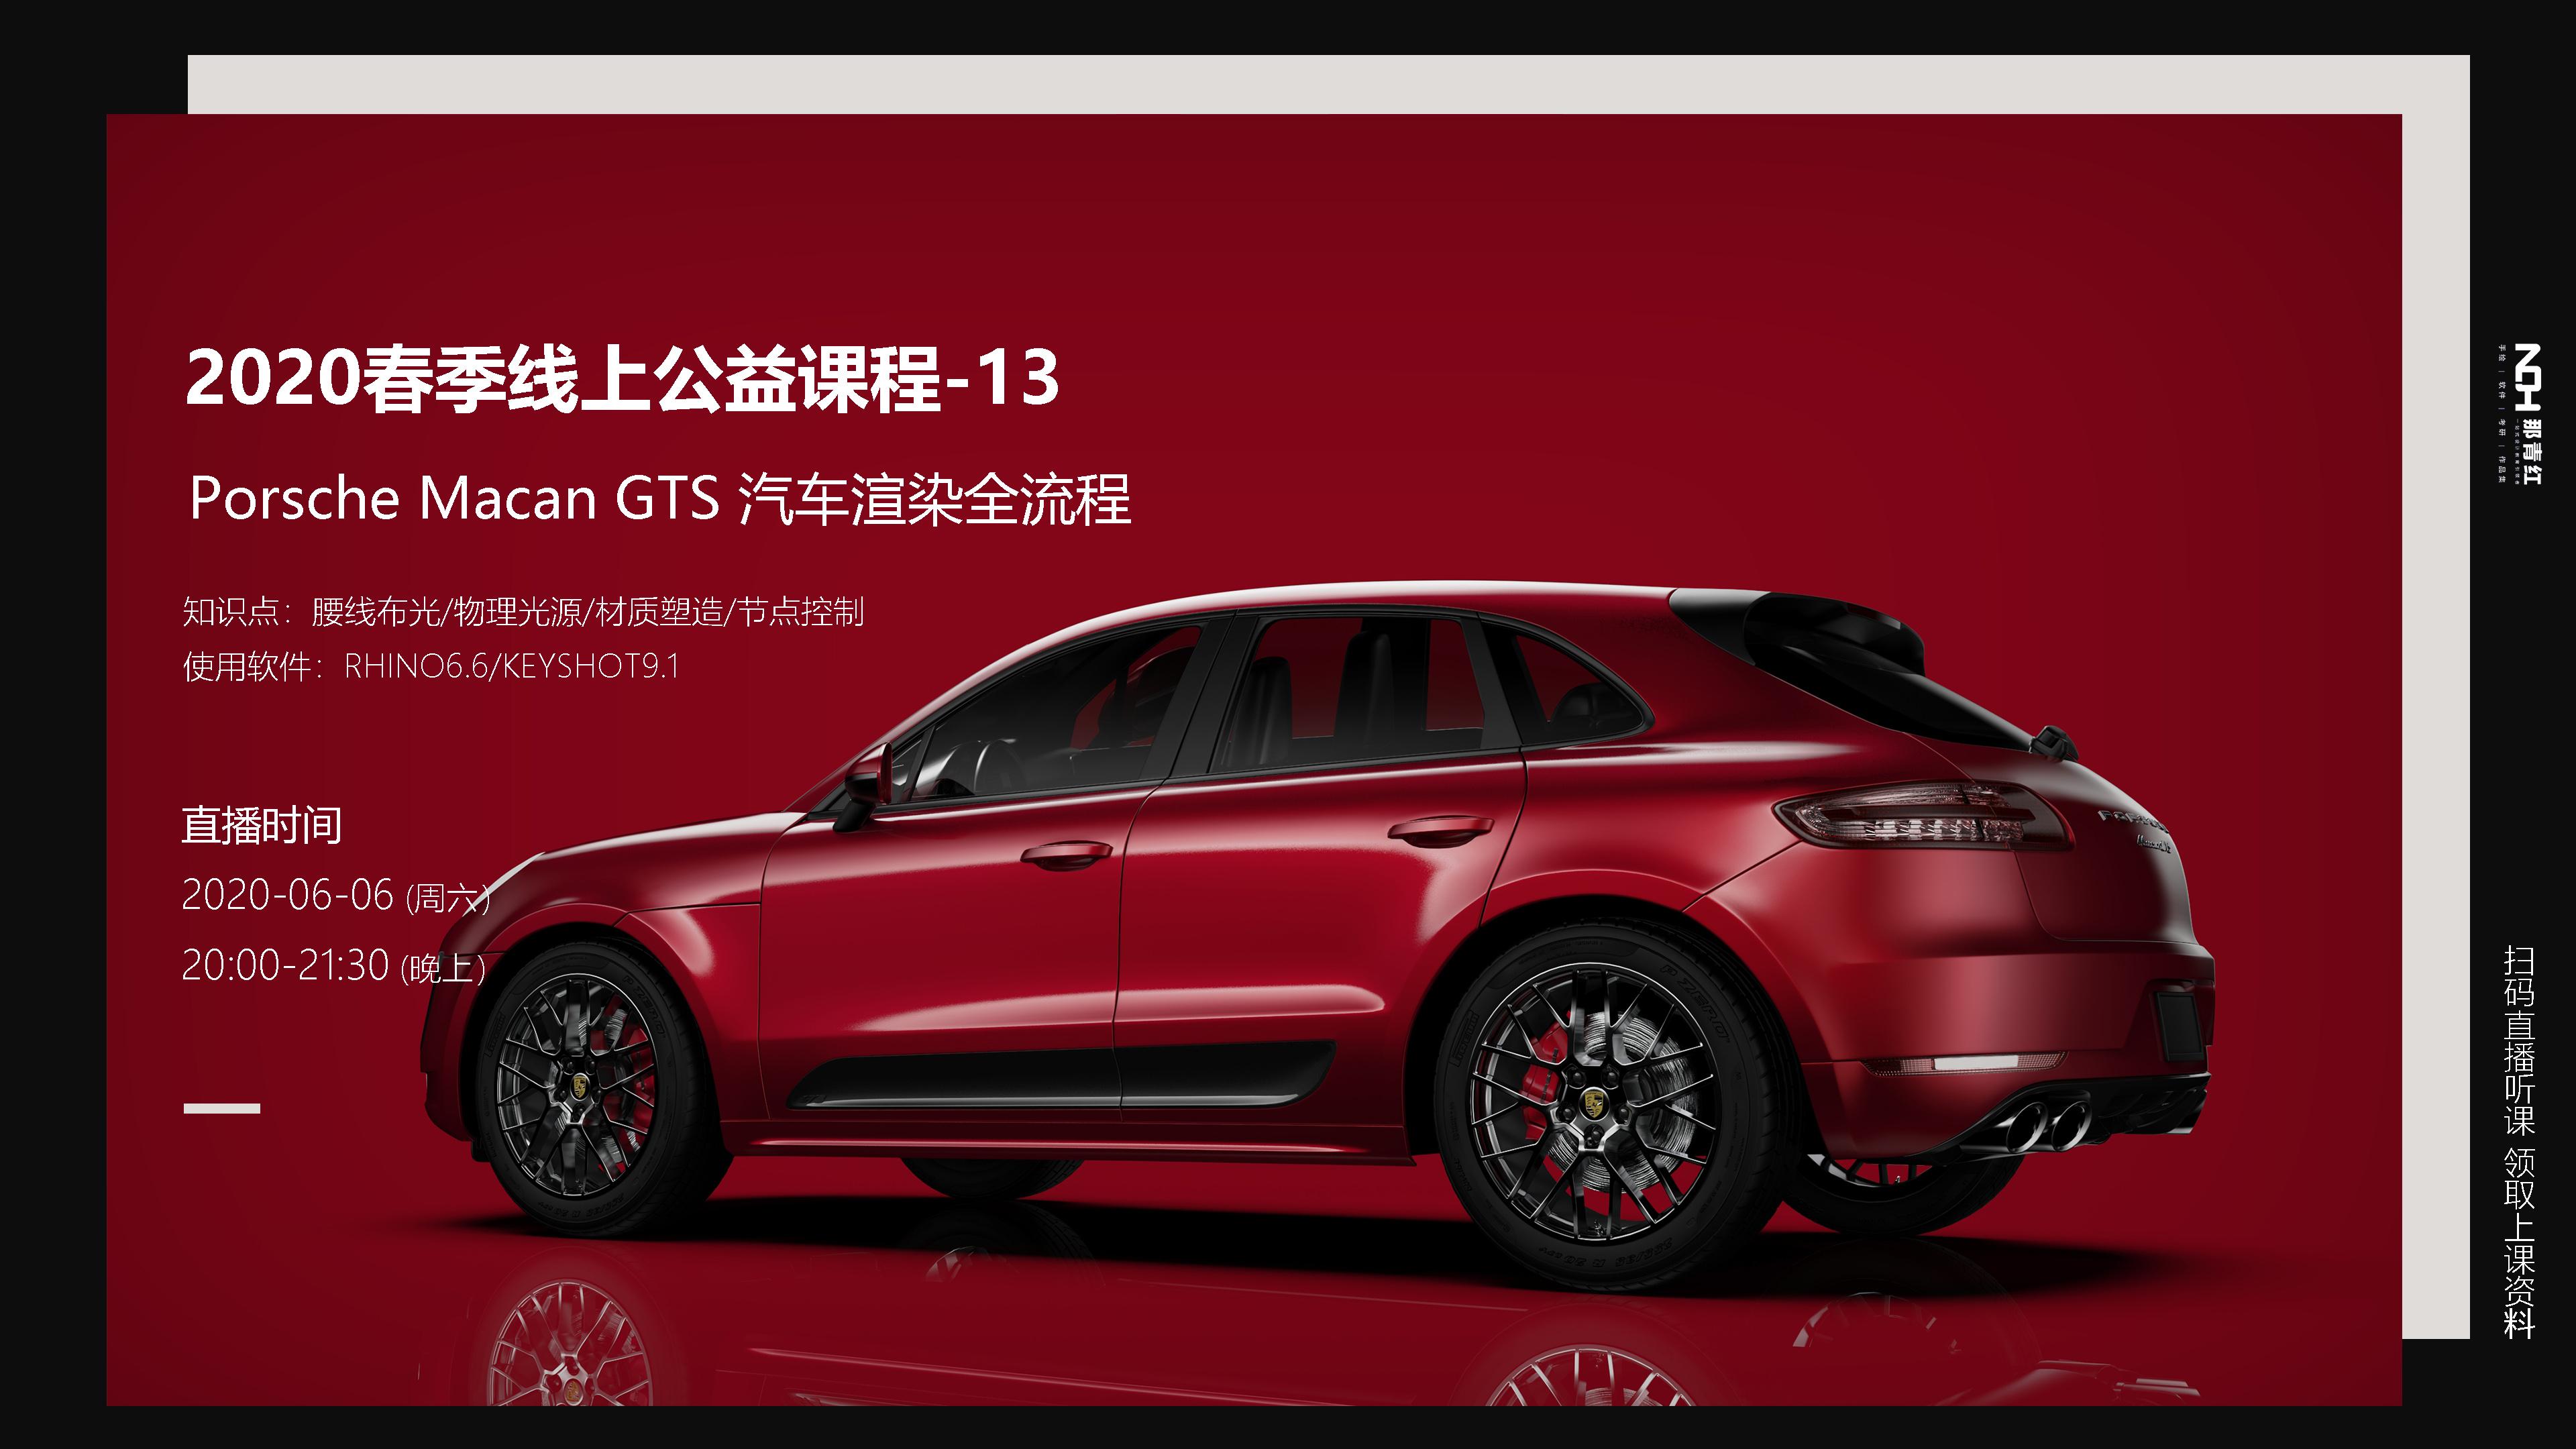 Porsche Macan GTS 保时捷-Rhino犀牛建模/Keyshot产品渲染